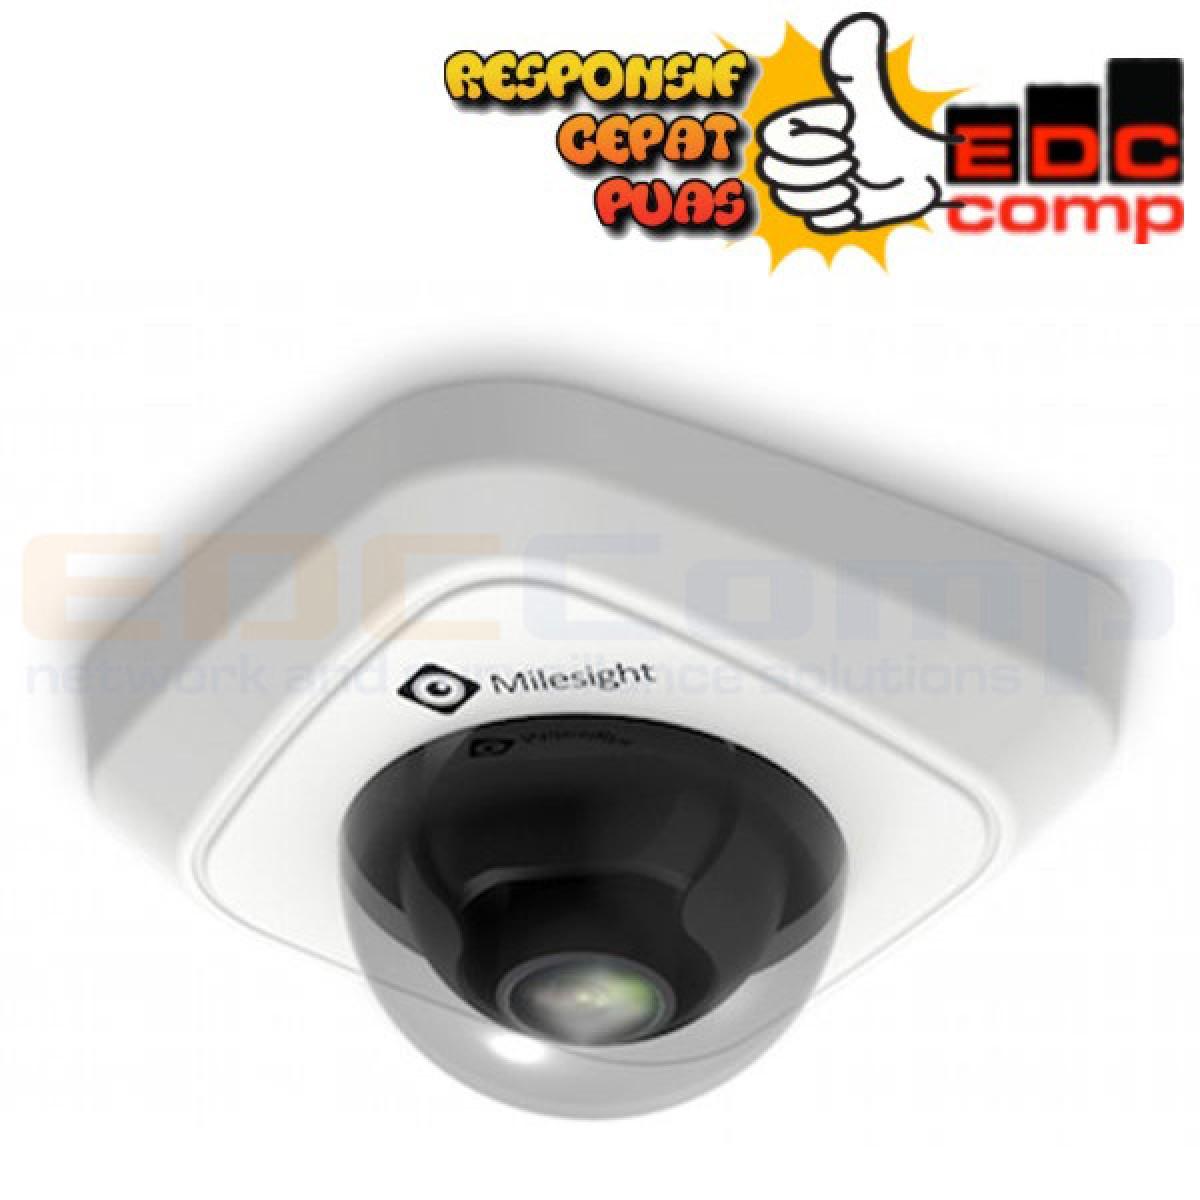 Milesight IP Cam Mini Dome MS-C2982-PB 2.0MP - White - EdcComp